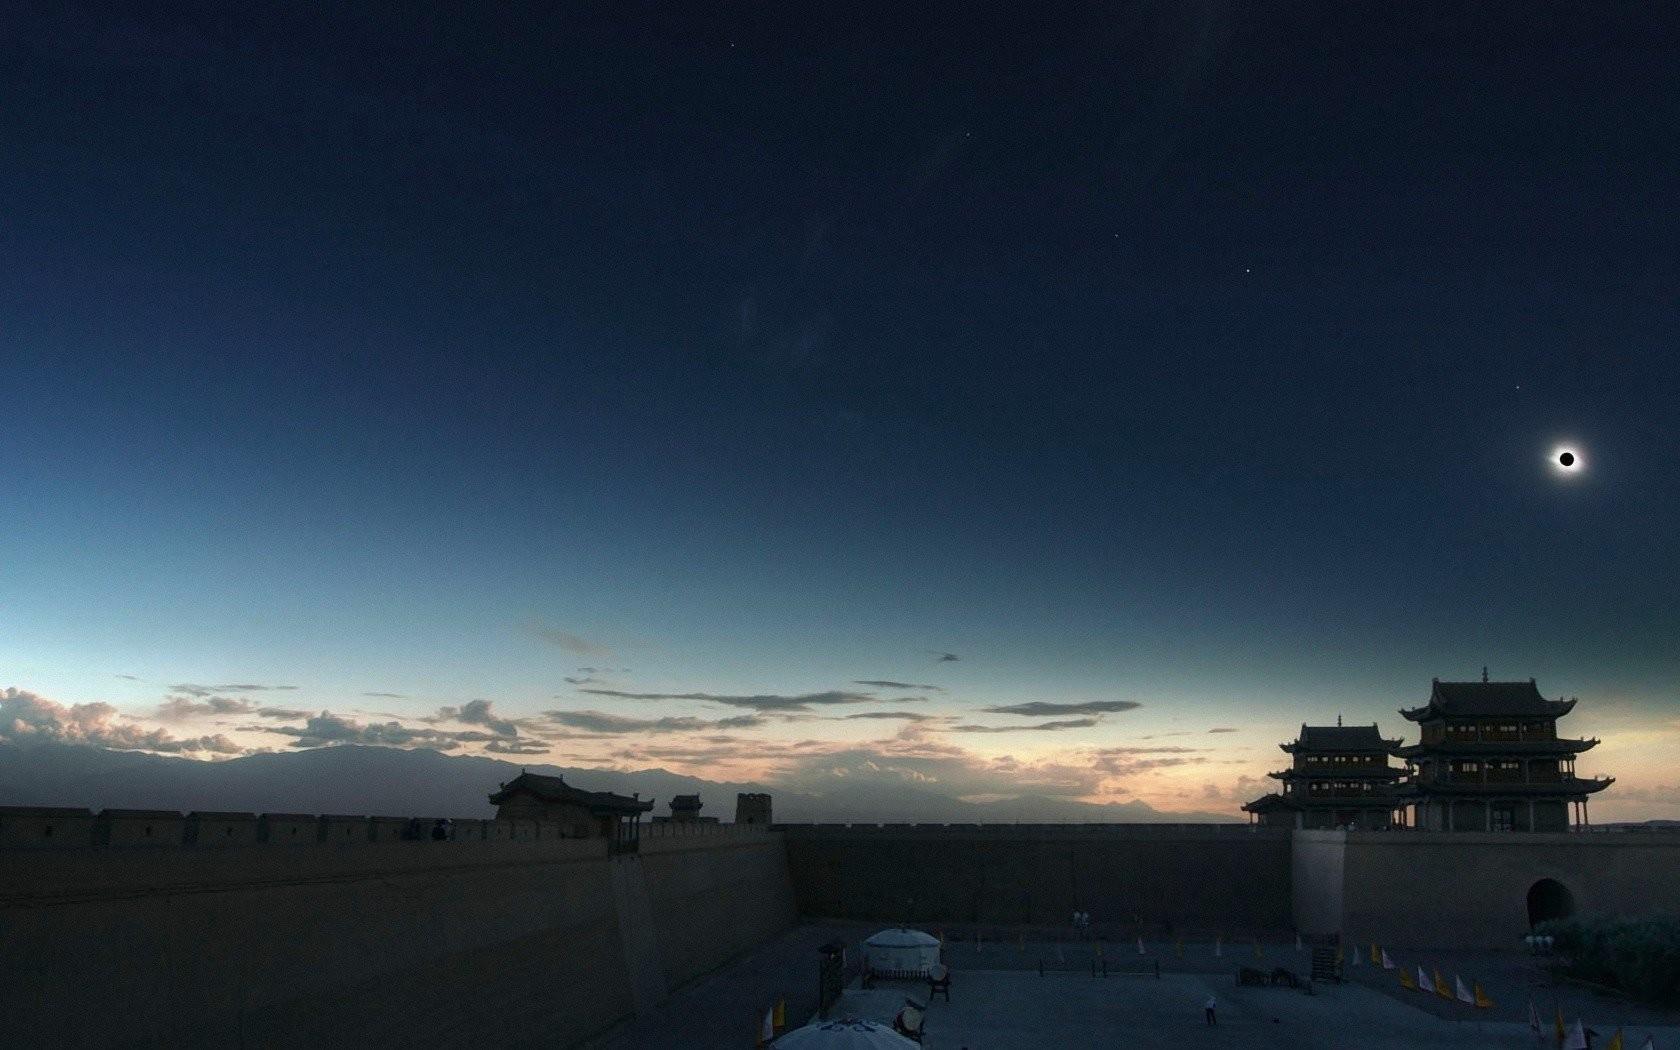 Digital Mobile Wallpaper Eclipse Backgrounds Artdownload 1680x1050